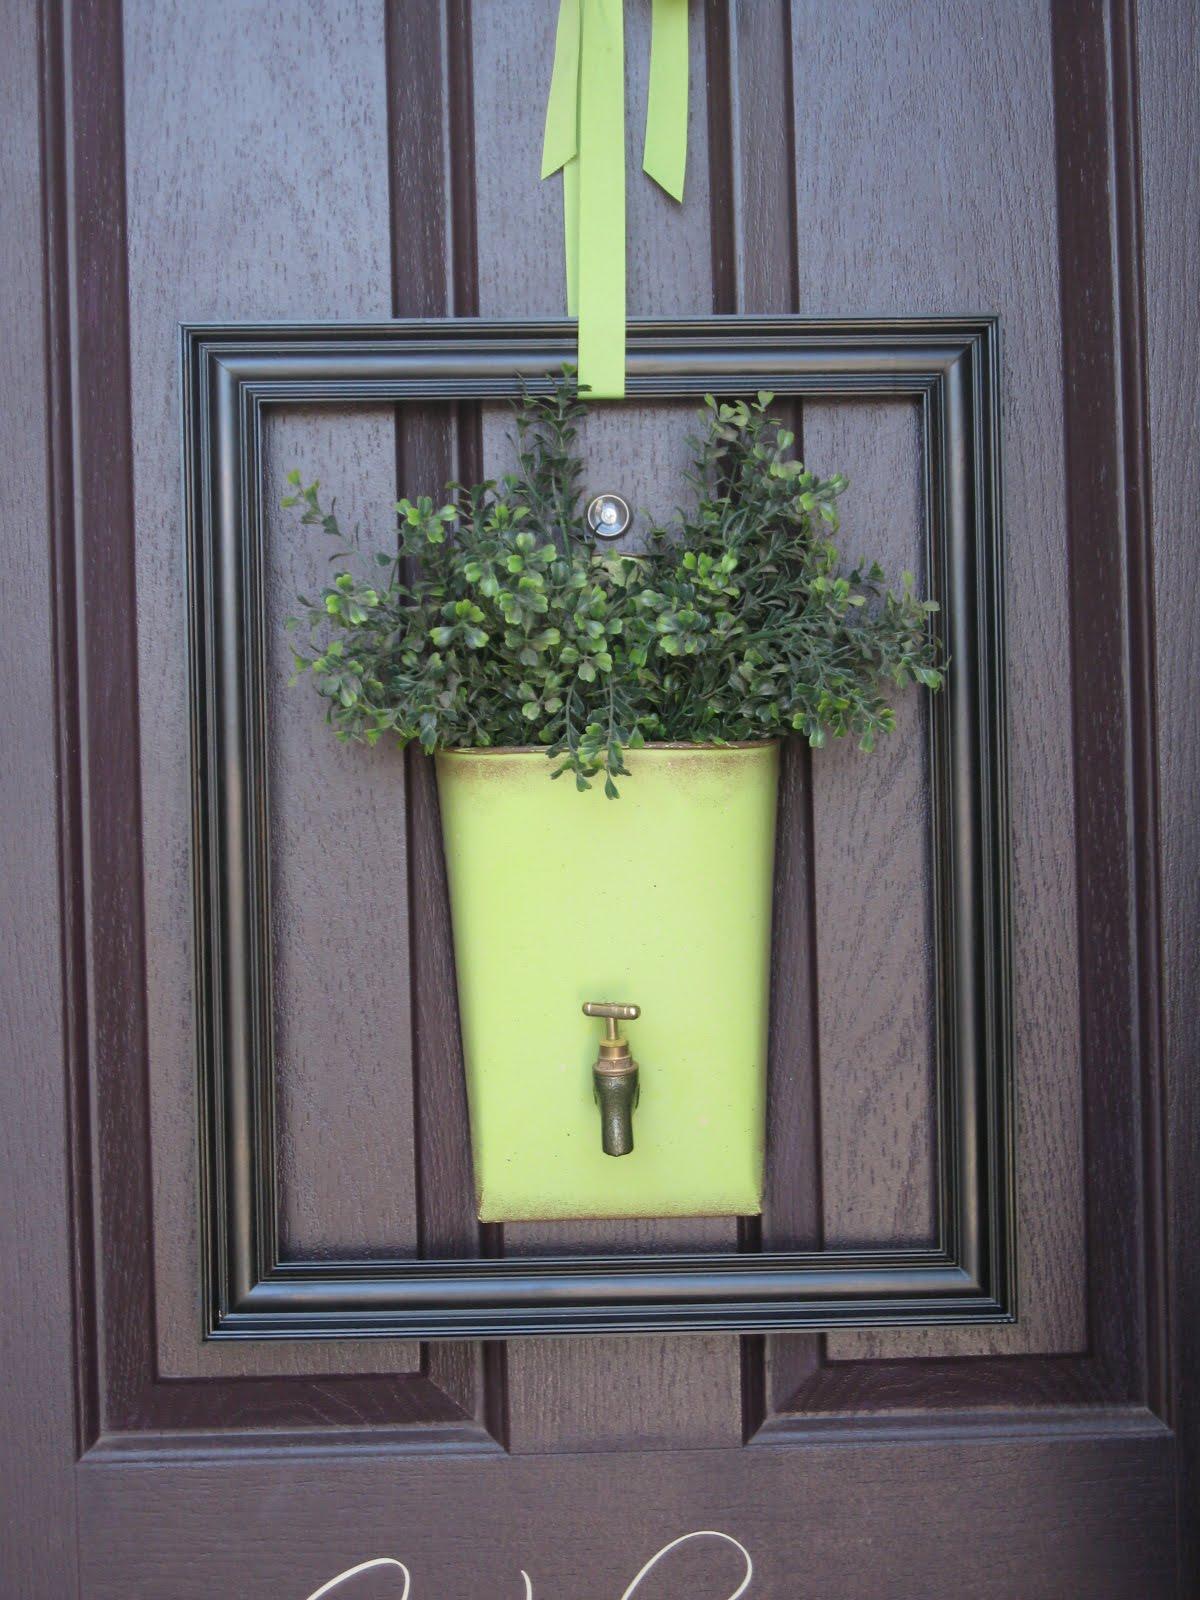 Not so usual front door decor no wreaths allowed - Front door entrance decorating ideas ...